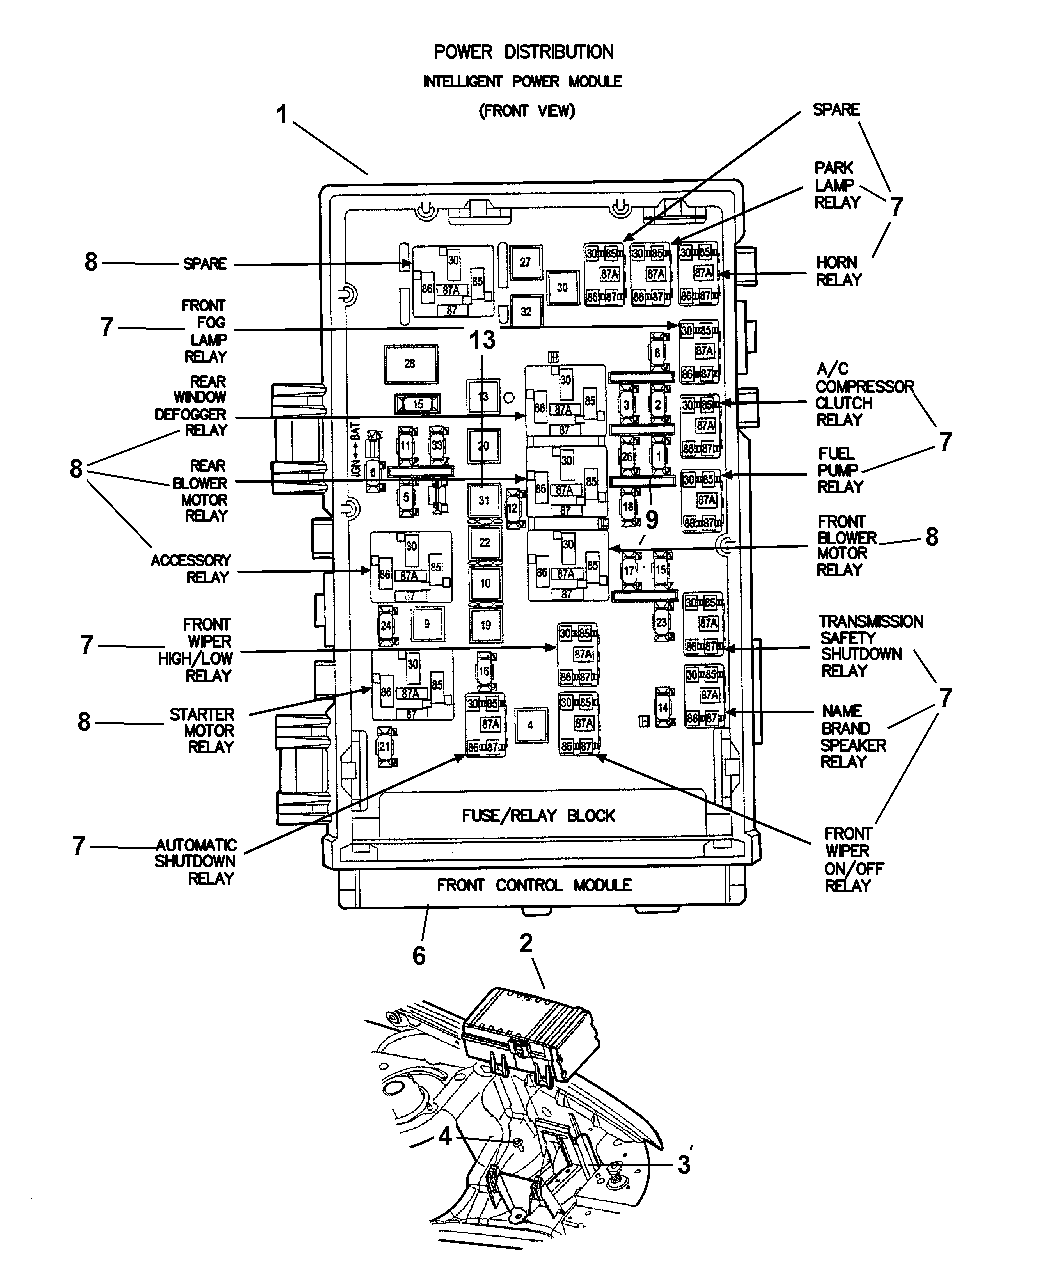 2004 Dodge Caravan Power Distribution Center, Relays & Fuses